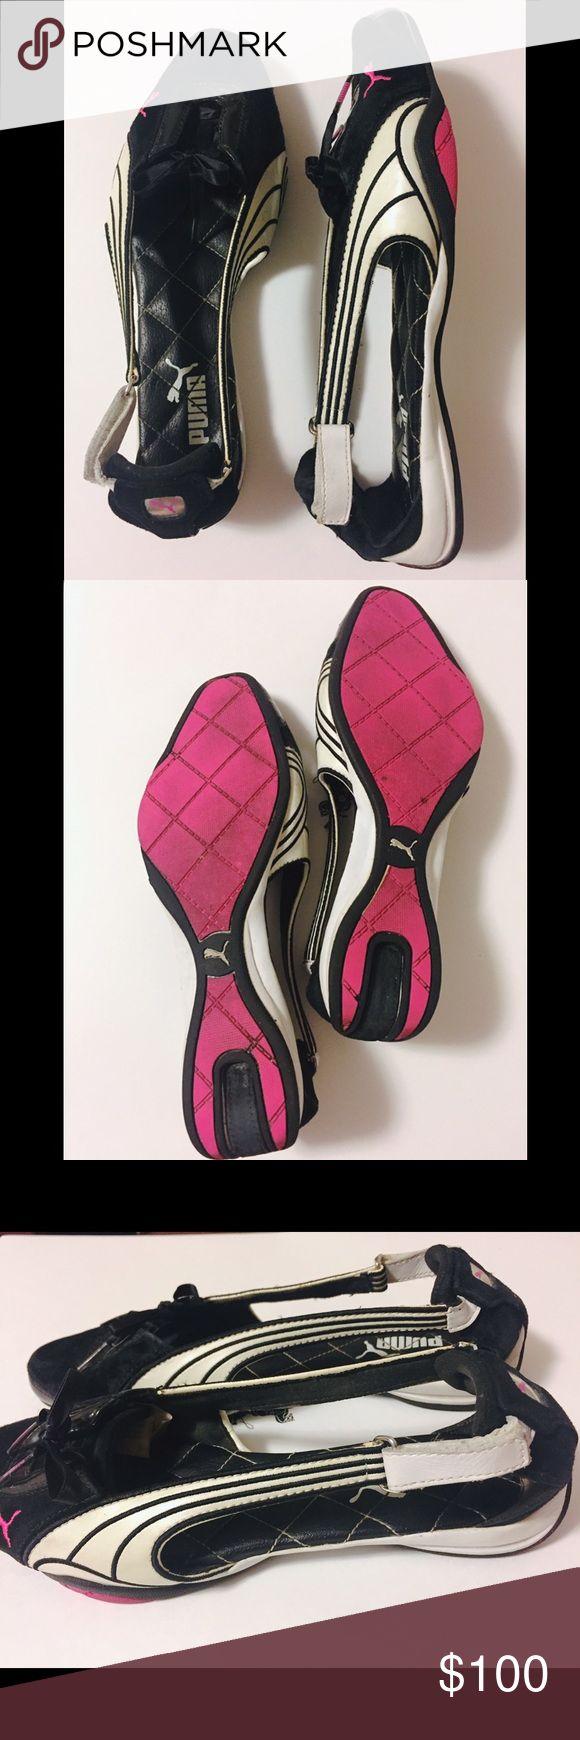 Puma black velcro sandals - Puma Unique Black Pink Genuine Leather Sandals